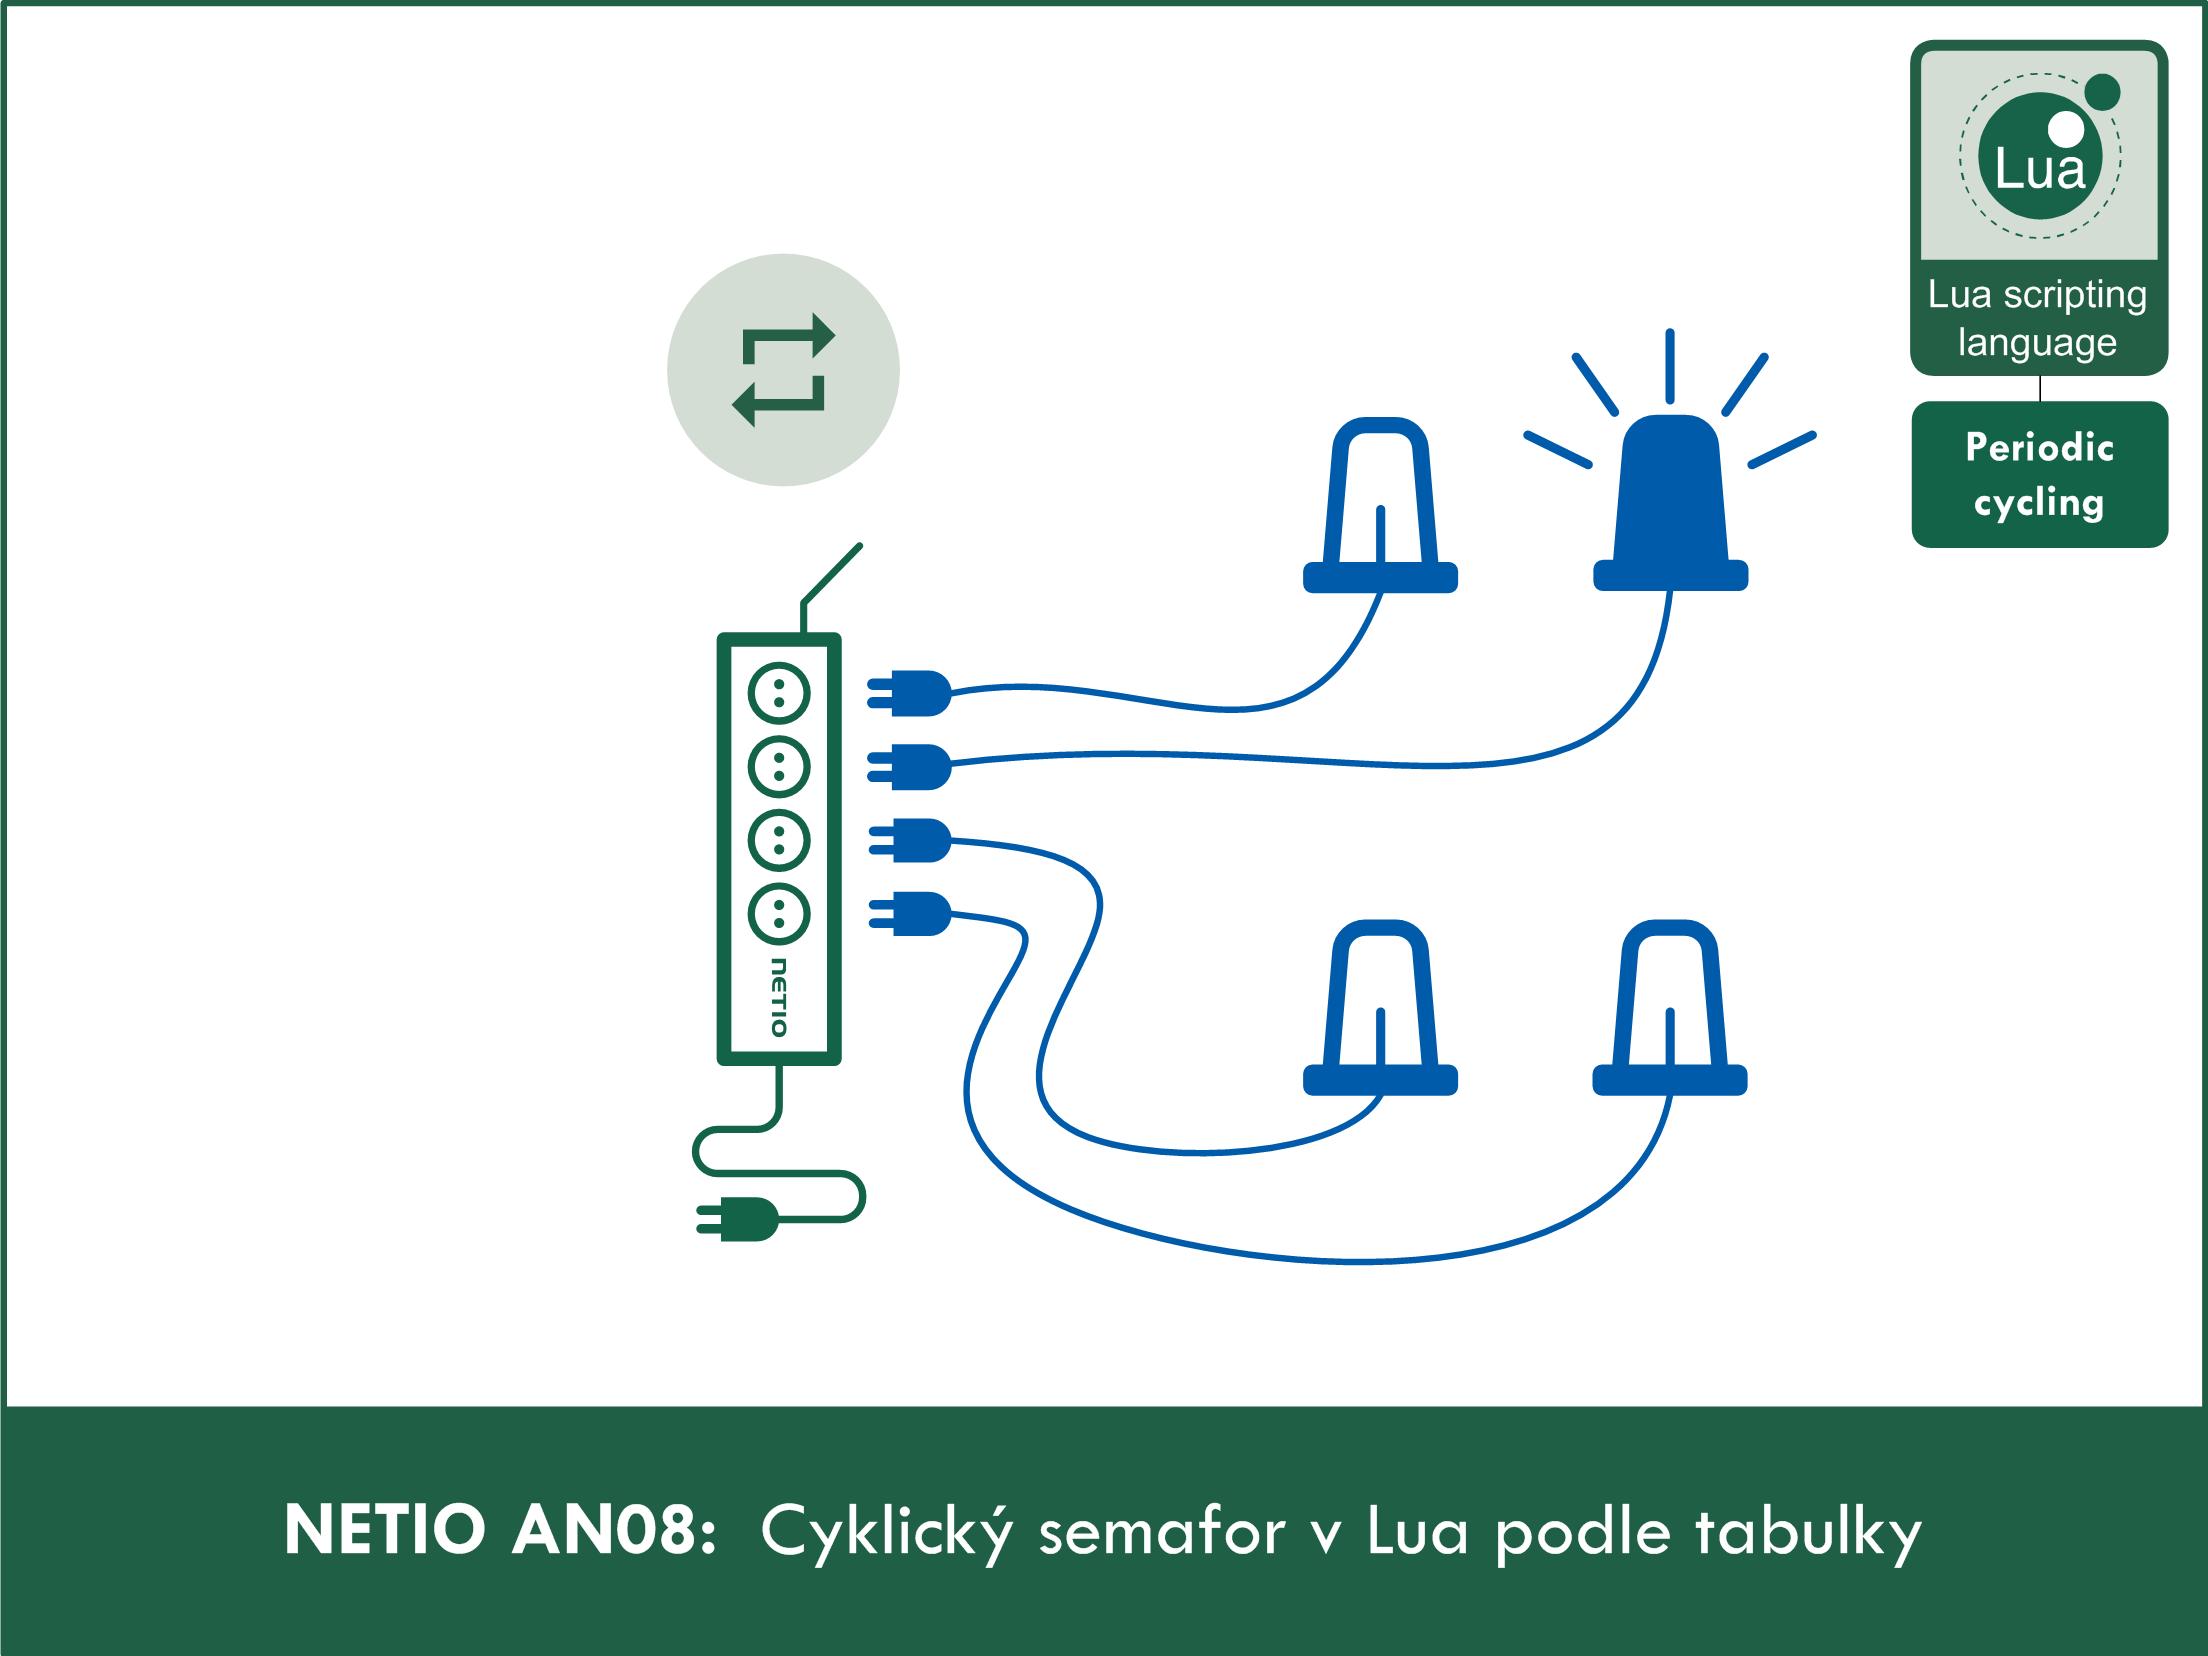 NETIO AN08 Cyklický semafor v Lua podle tabulky